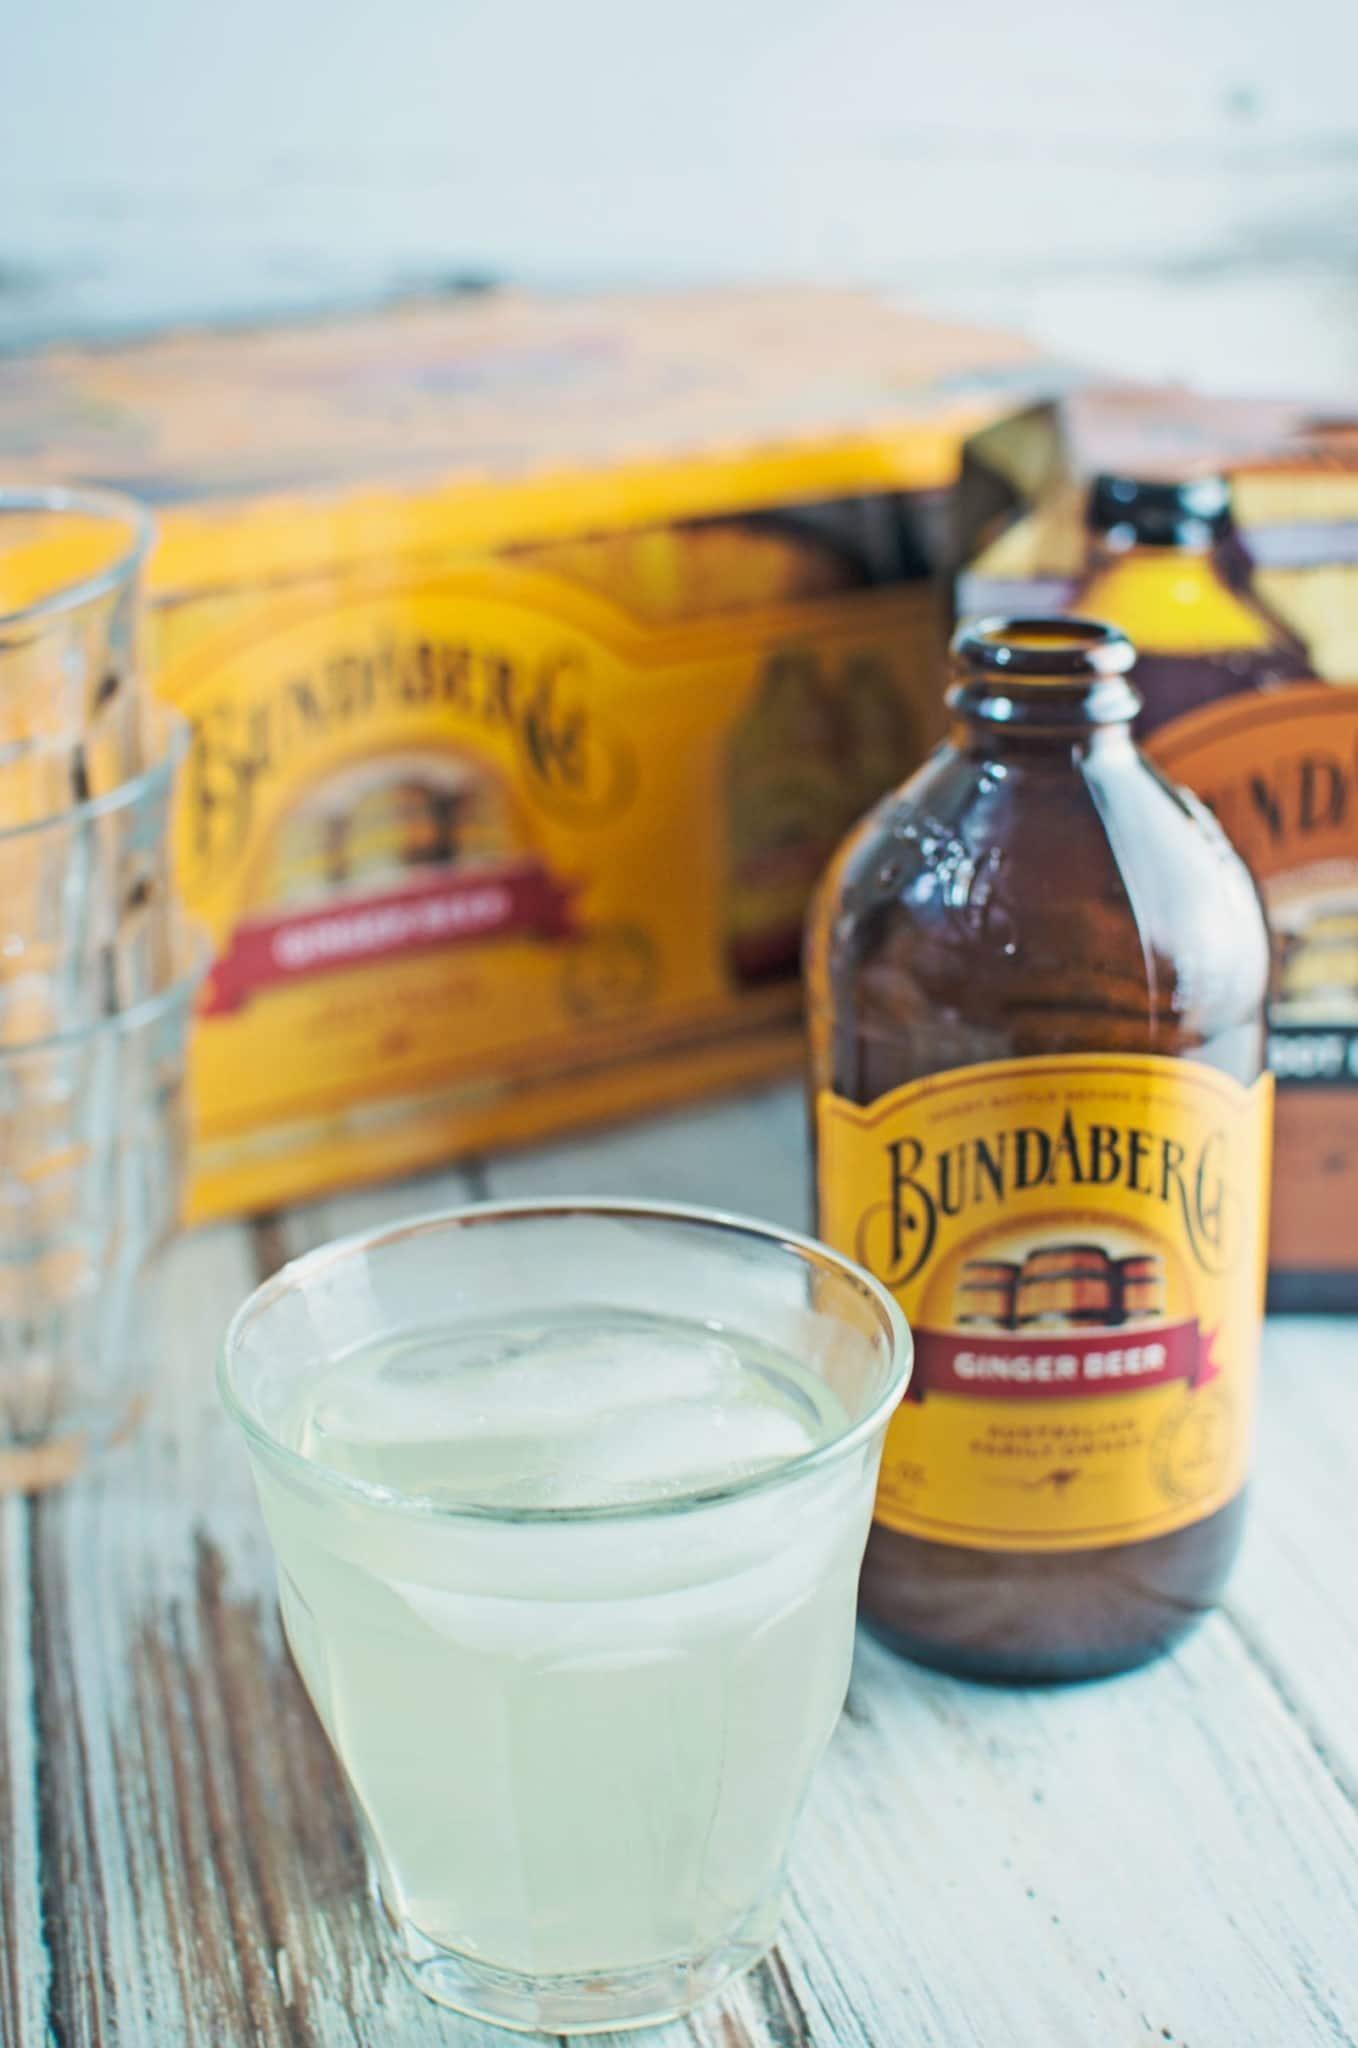 Bundaberg Ginger Beer is a gorgeous drink to enjoy. #ad #worldmarkettribe #AusOpen